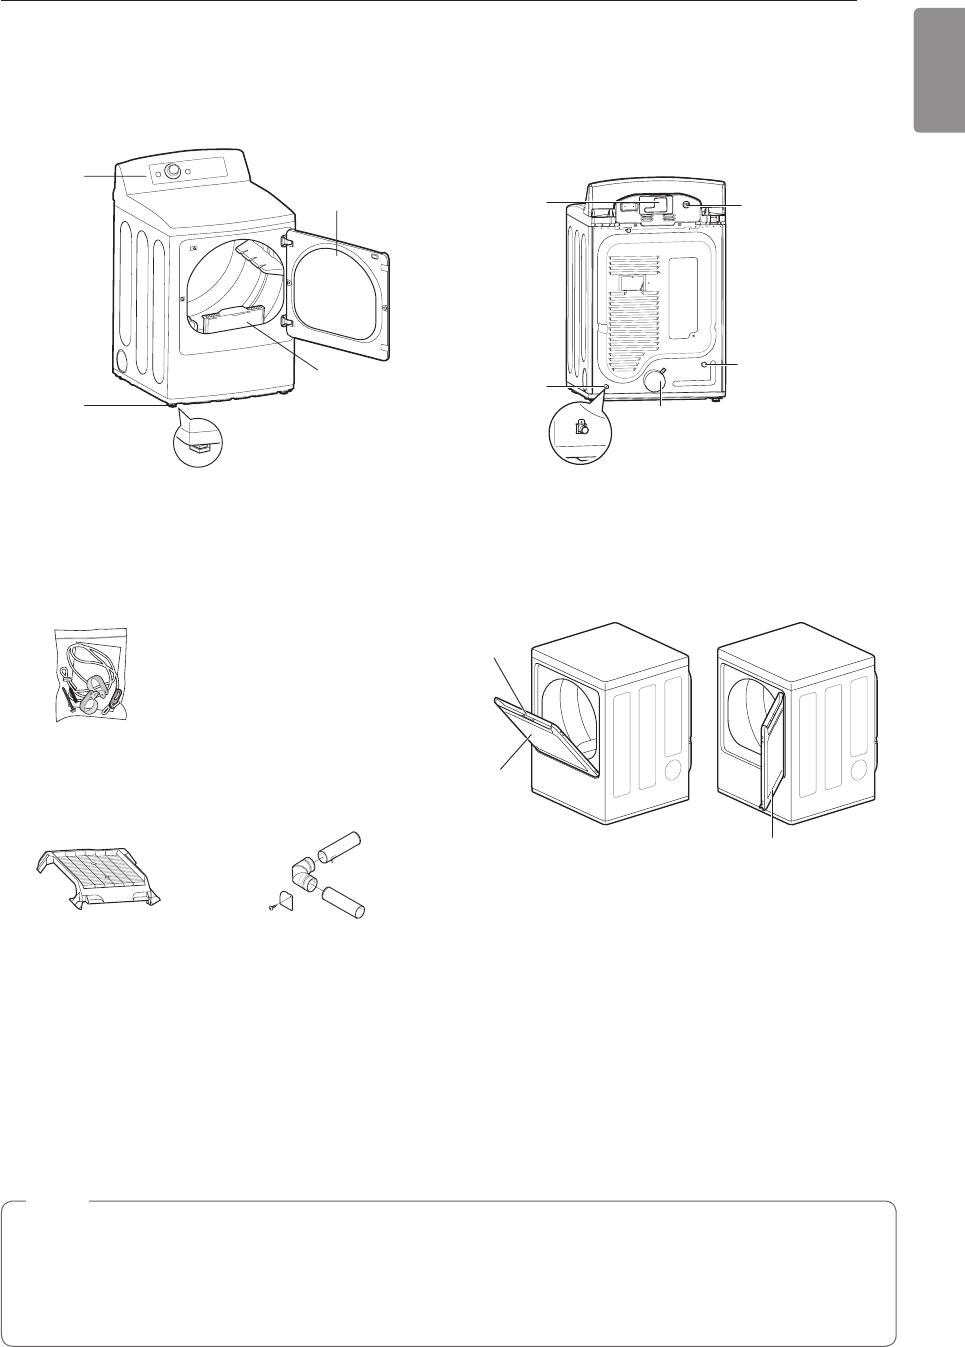 LG DLE7200WE MFL67731095_en_161110 User Manual DRYER